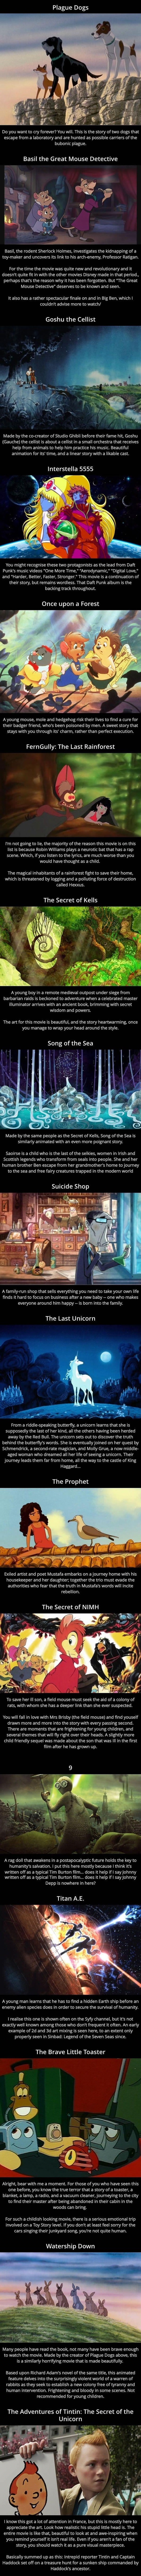 Underappreciated animated movies